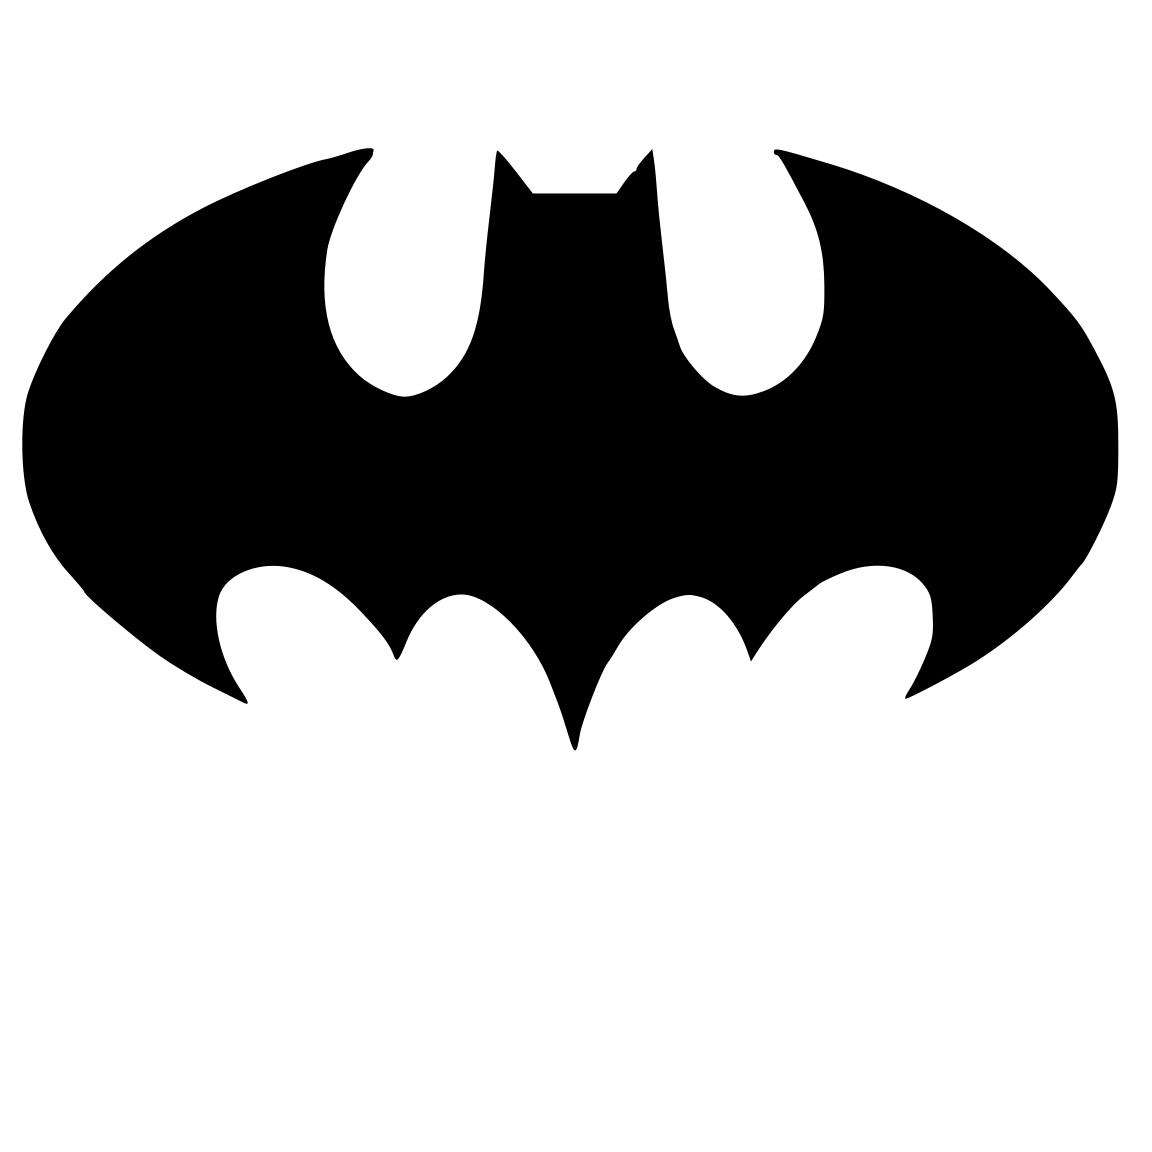 1152x1152 Cutting Files For You Batman Crafts Batman Party